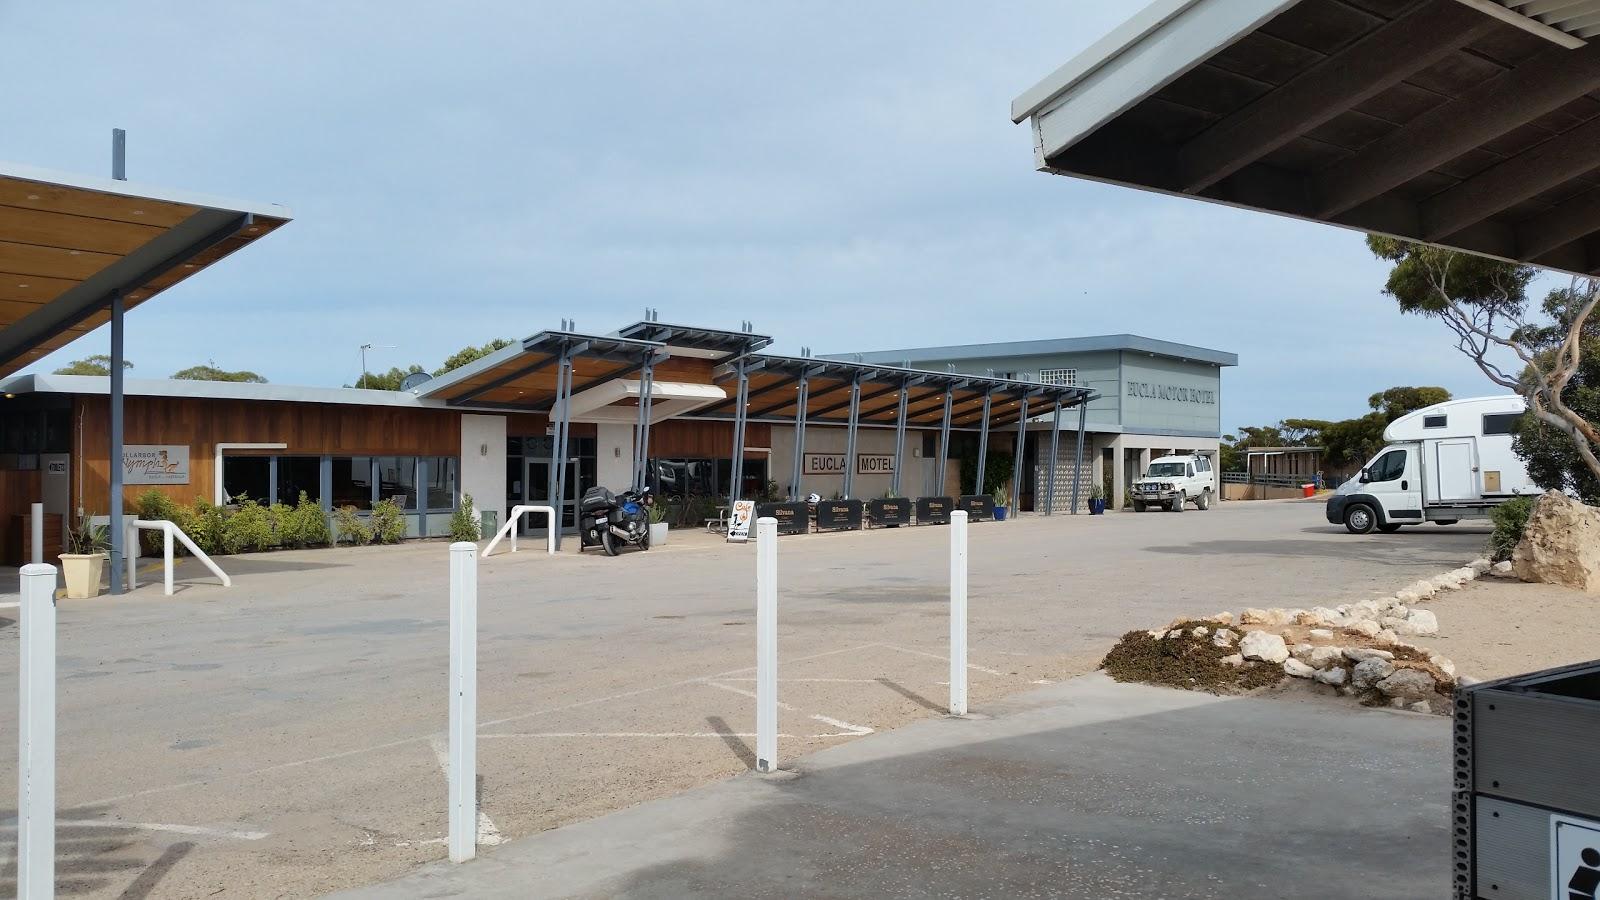 Eucla Motel And Caravan Park